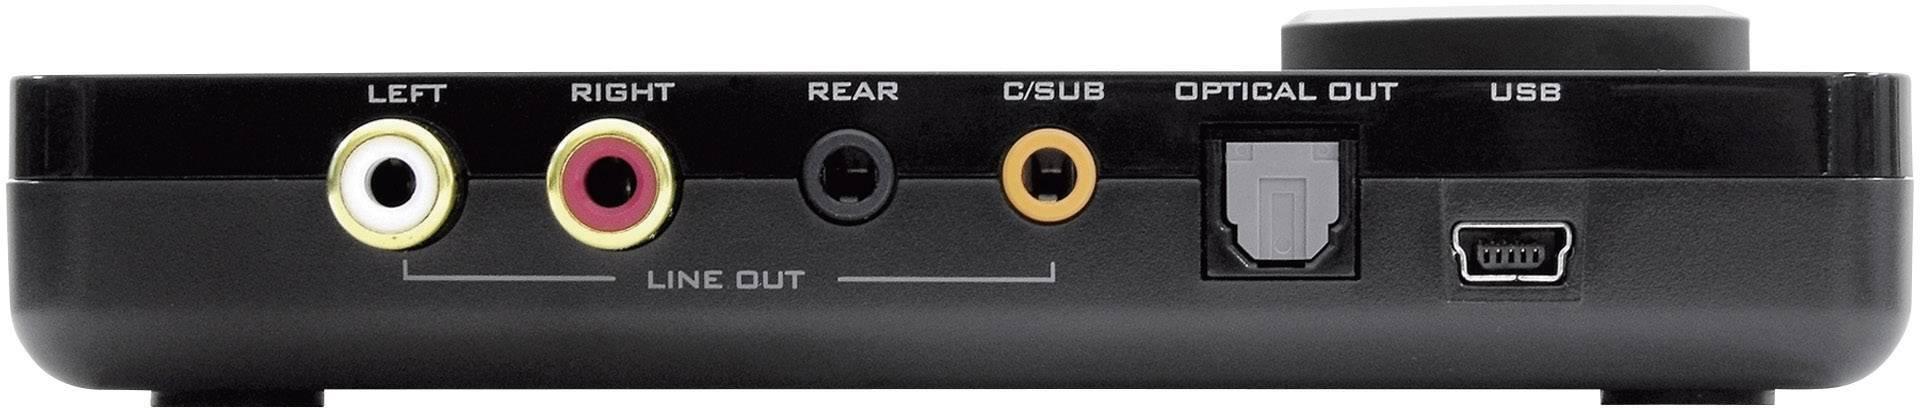 Wonderbaarlijk 5.1 Externe geluidskaart Sound Blaster SoundBlaster X-FI Surround TU-72